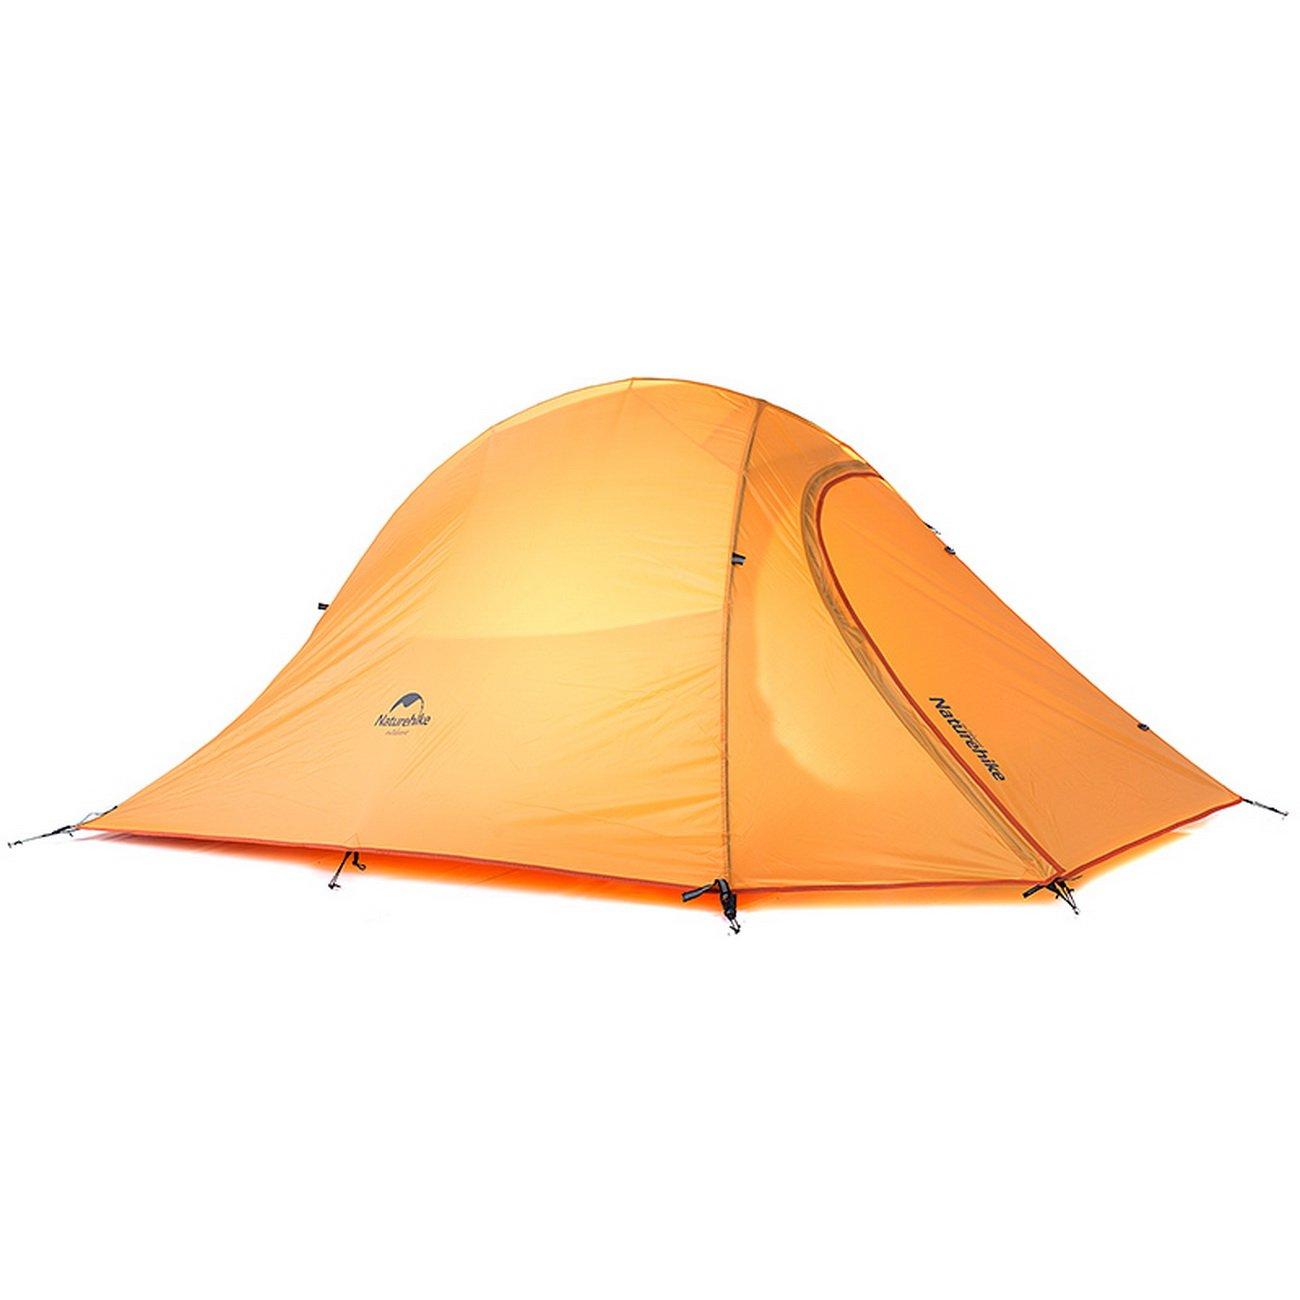 Naturehike Cloud Up 2 Ultralight Zelt Kostenlose 20D 210T Stoff Camping Zelte für 2 Personen mit kostenlosen Mat NH15T002-T